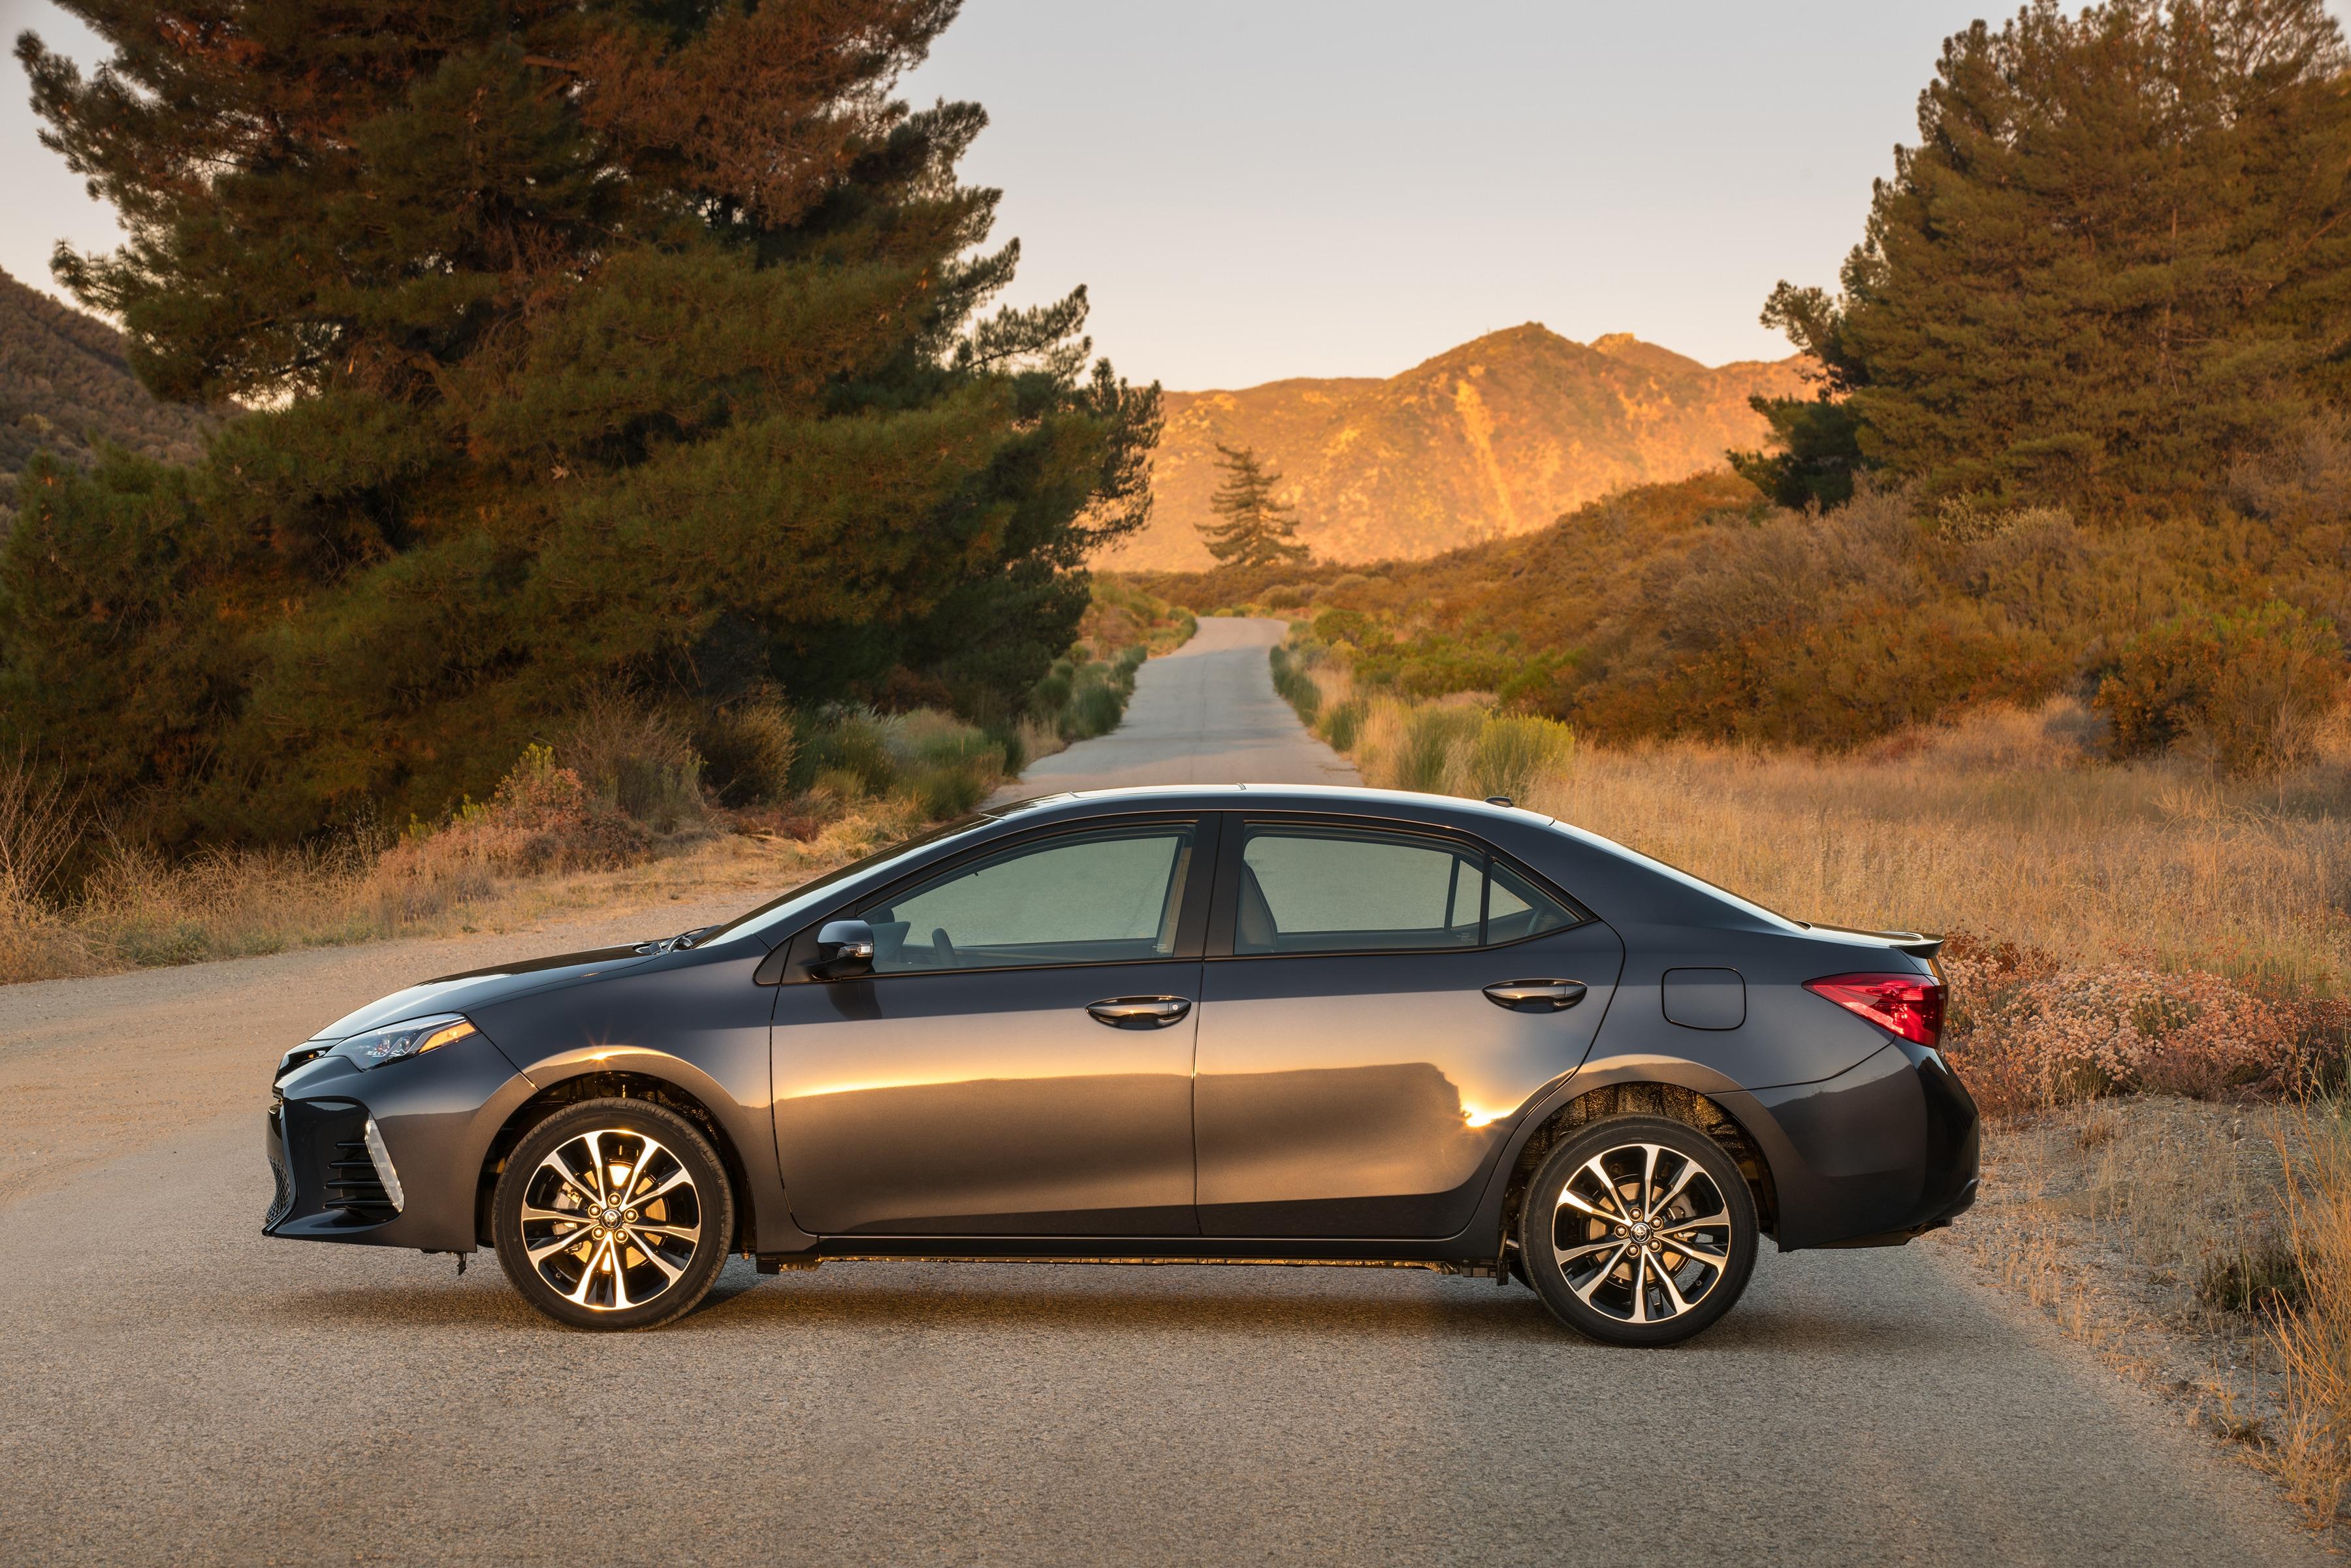 Toyota Corolla Repair Manual: Confirmation driving pattern